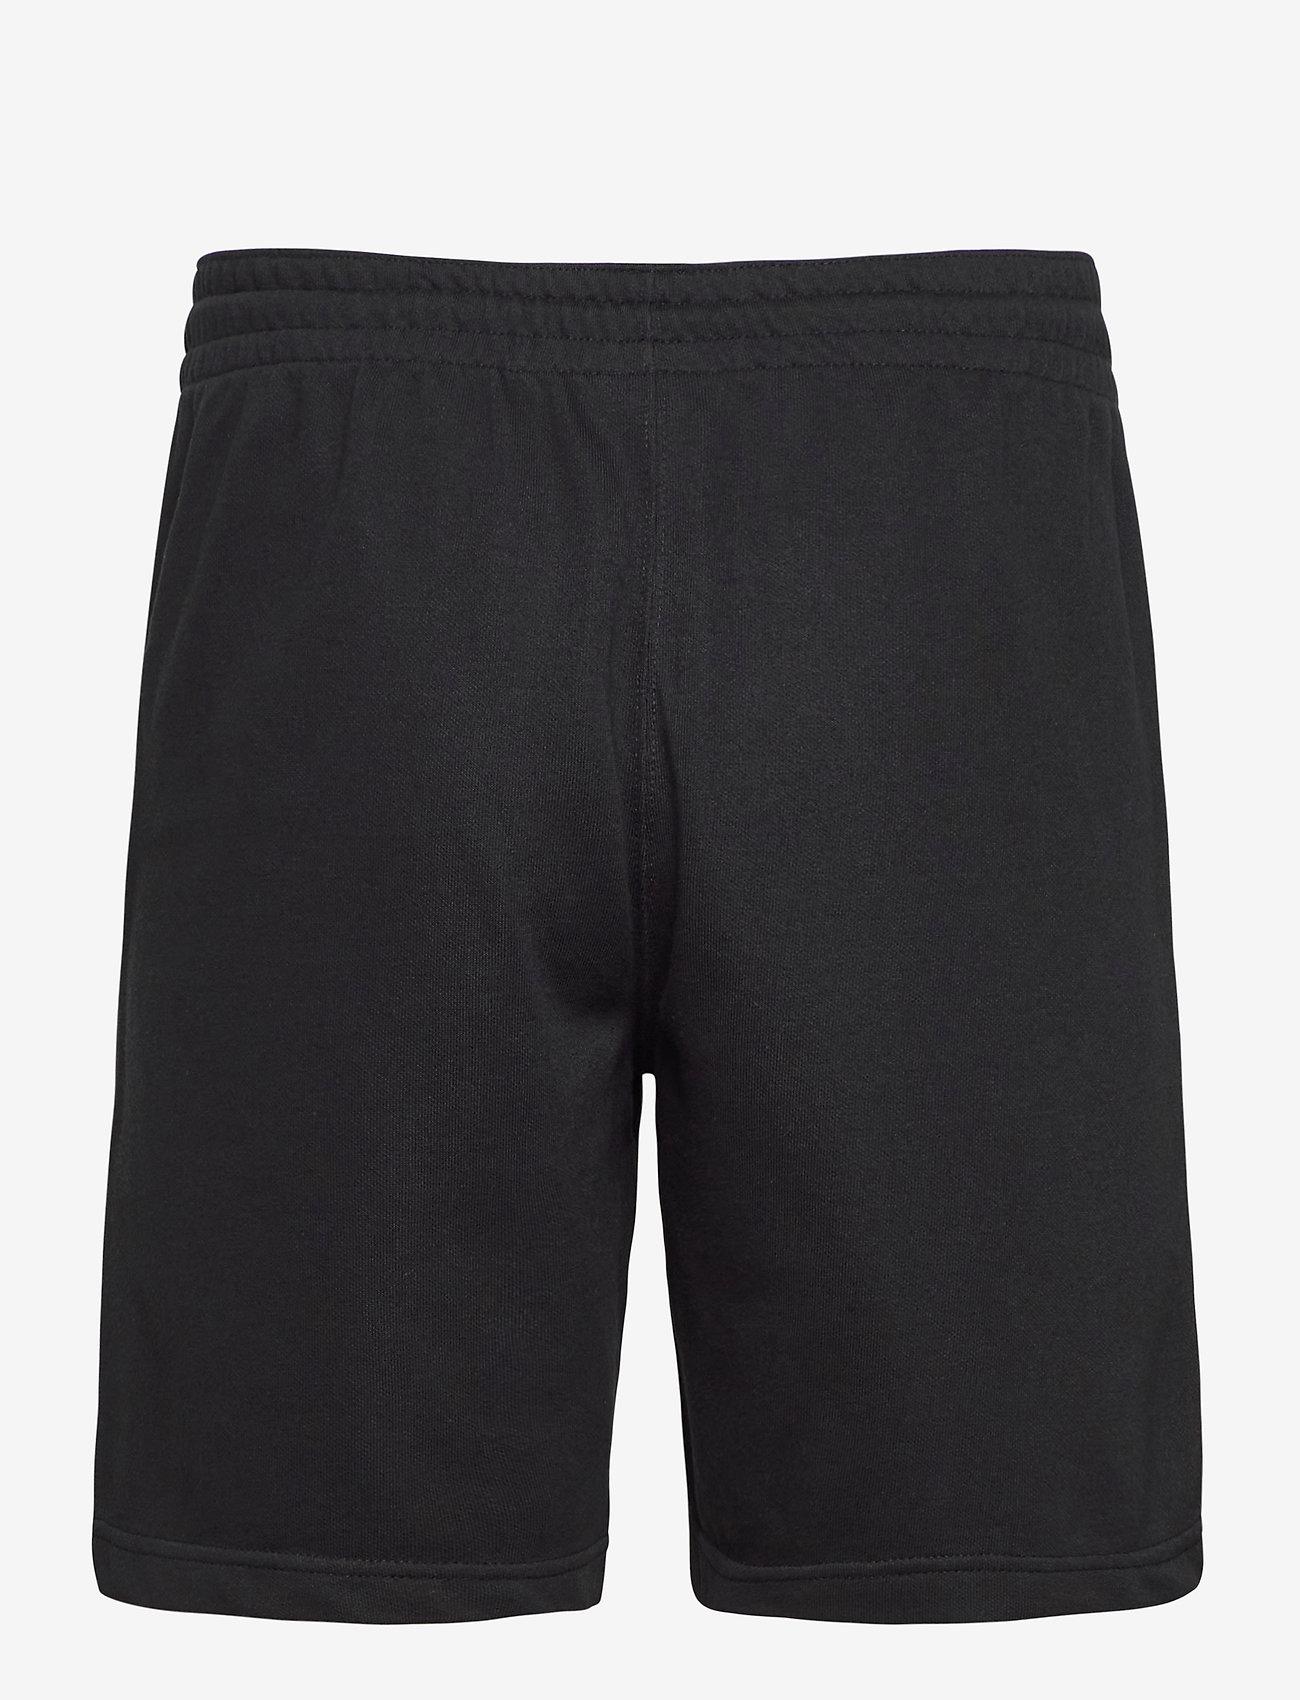 Shorts (Black Beauty) - Champion xyyLVI